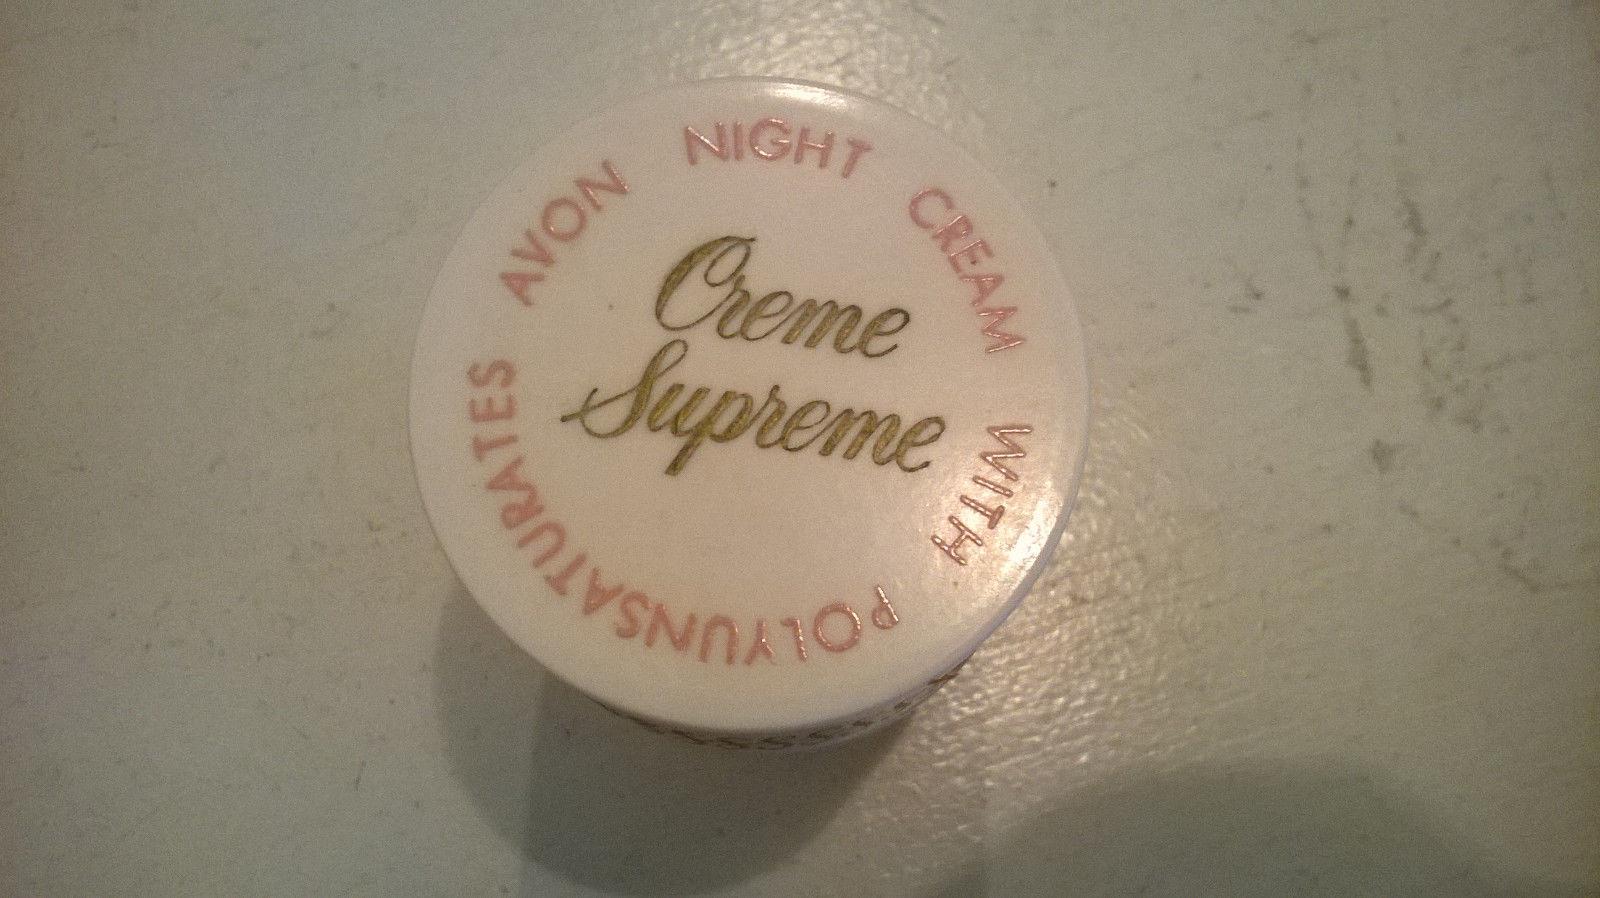 Avon Creme Supreme 2.25 oz Empty Pedestal Jar Vintage pink jar